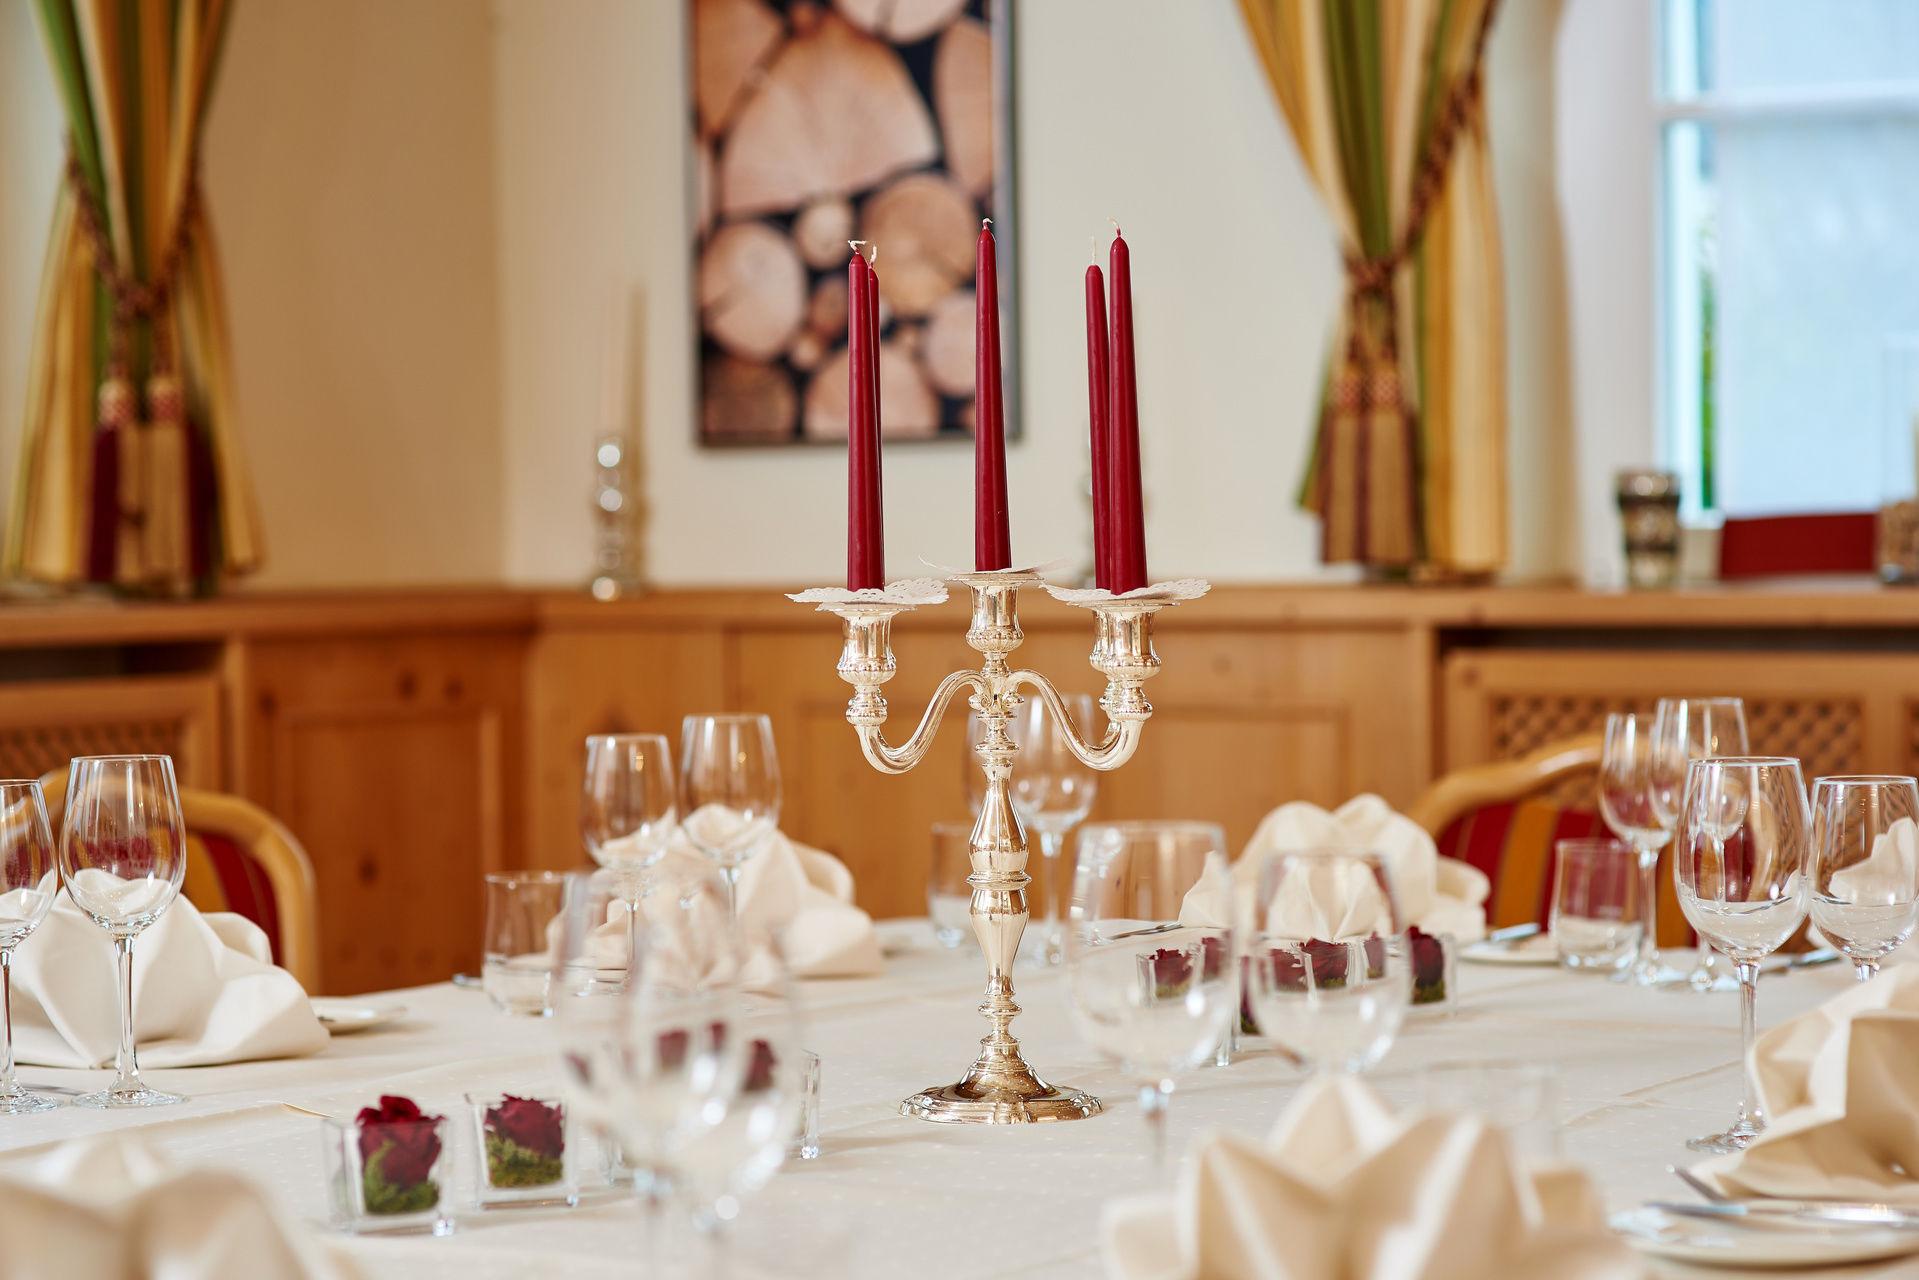 Gastebuch 4 Sterne Hotel Am See Neutraubling Regensburger Land